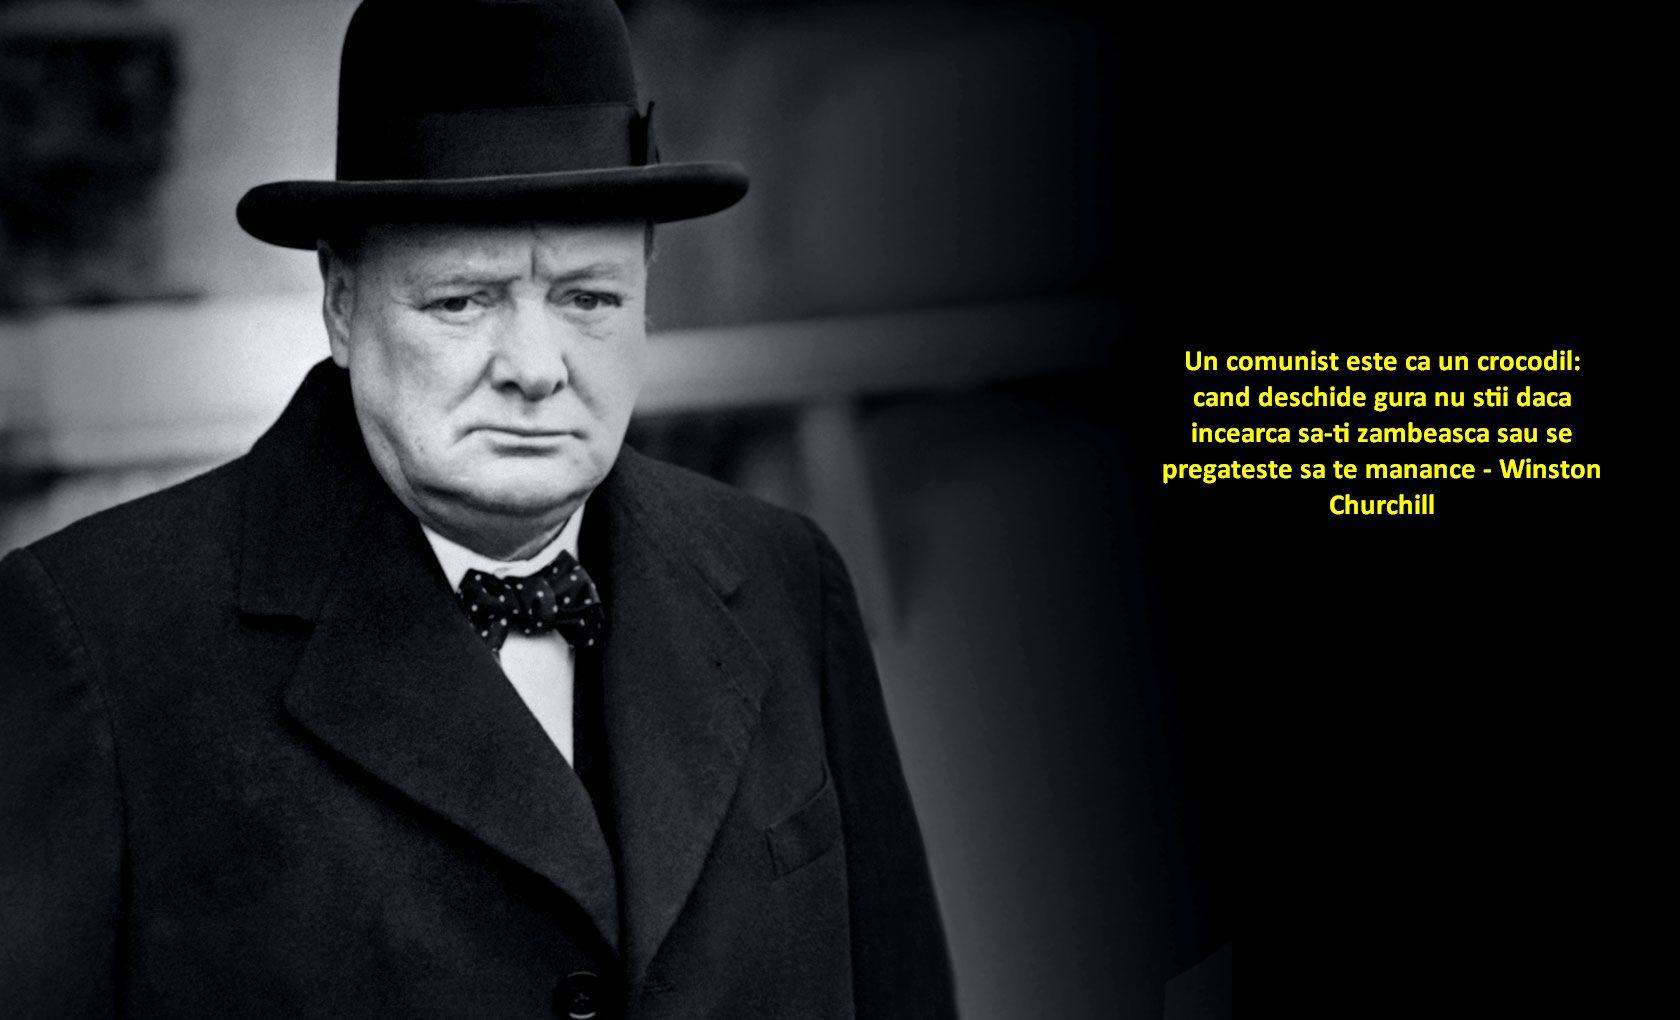 Un comunist este ca un crocodil: cand deschide gura nu stii daca incearca sa-ti zambeasca sau se pregateste sa te manance – Winston Churchill